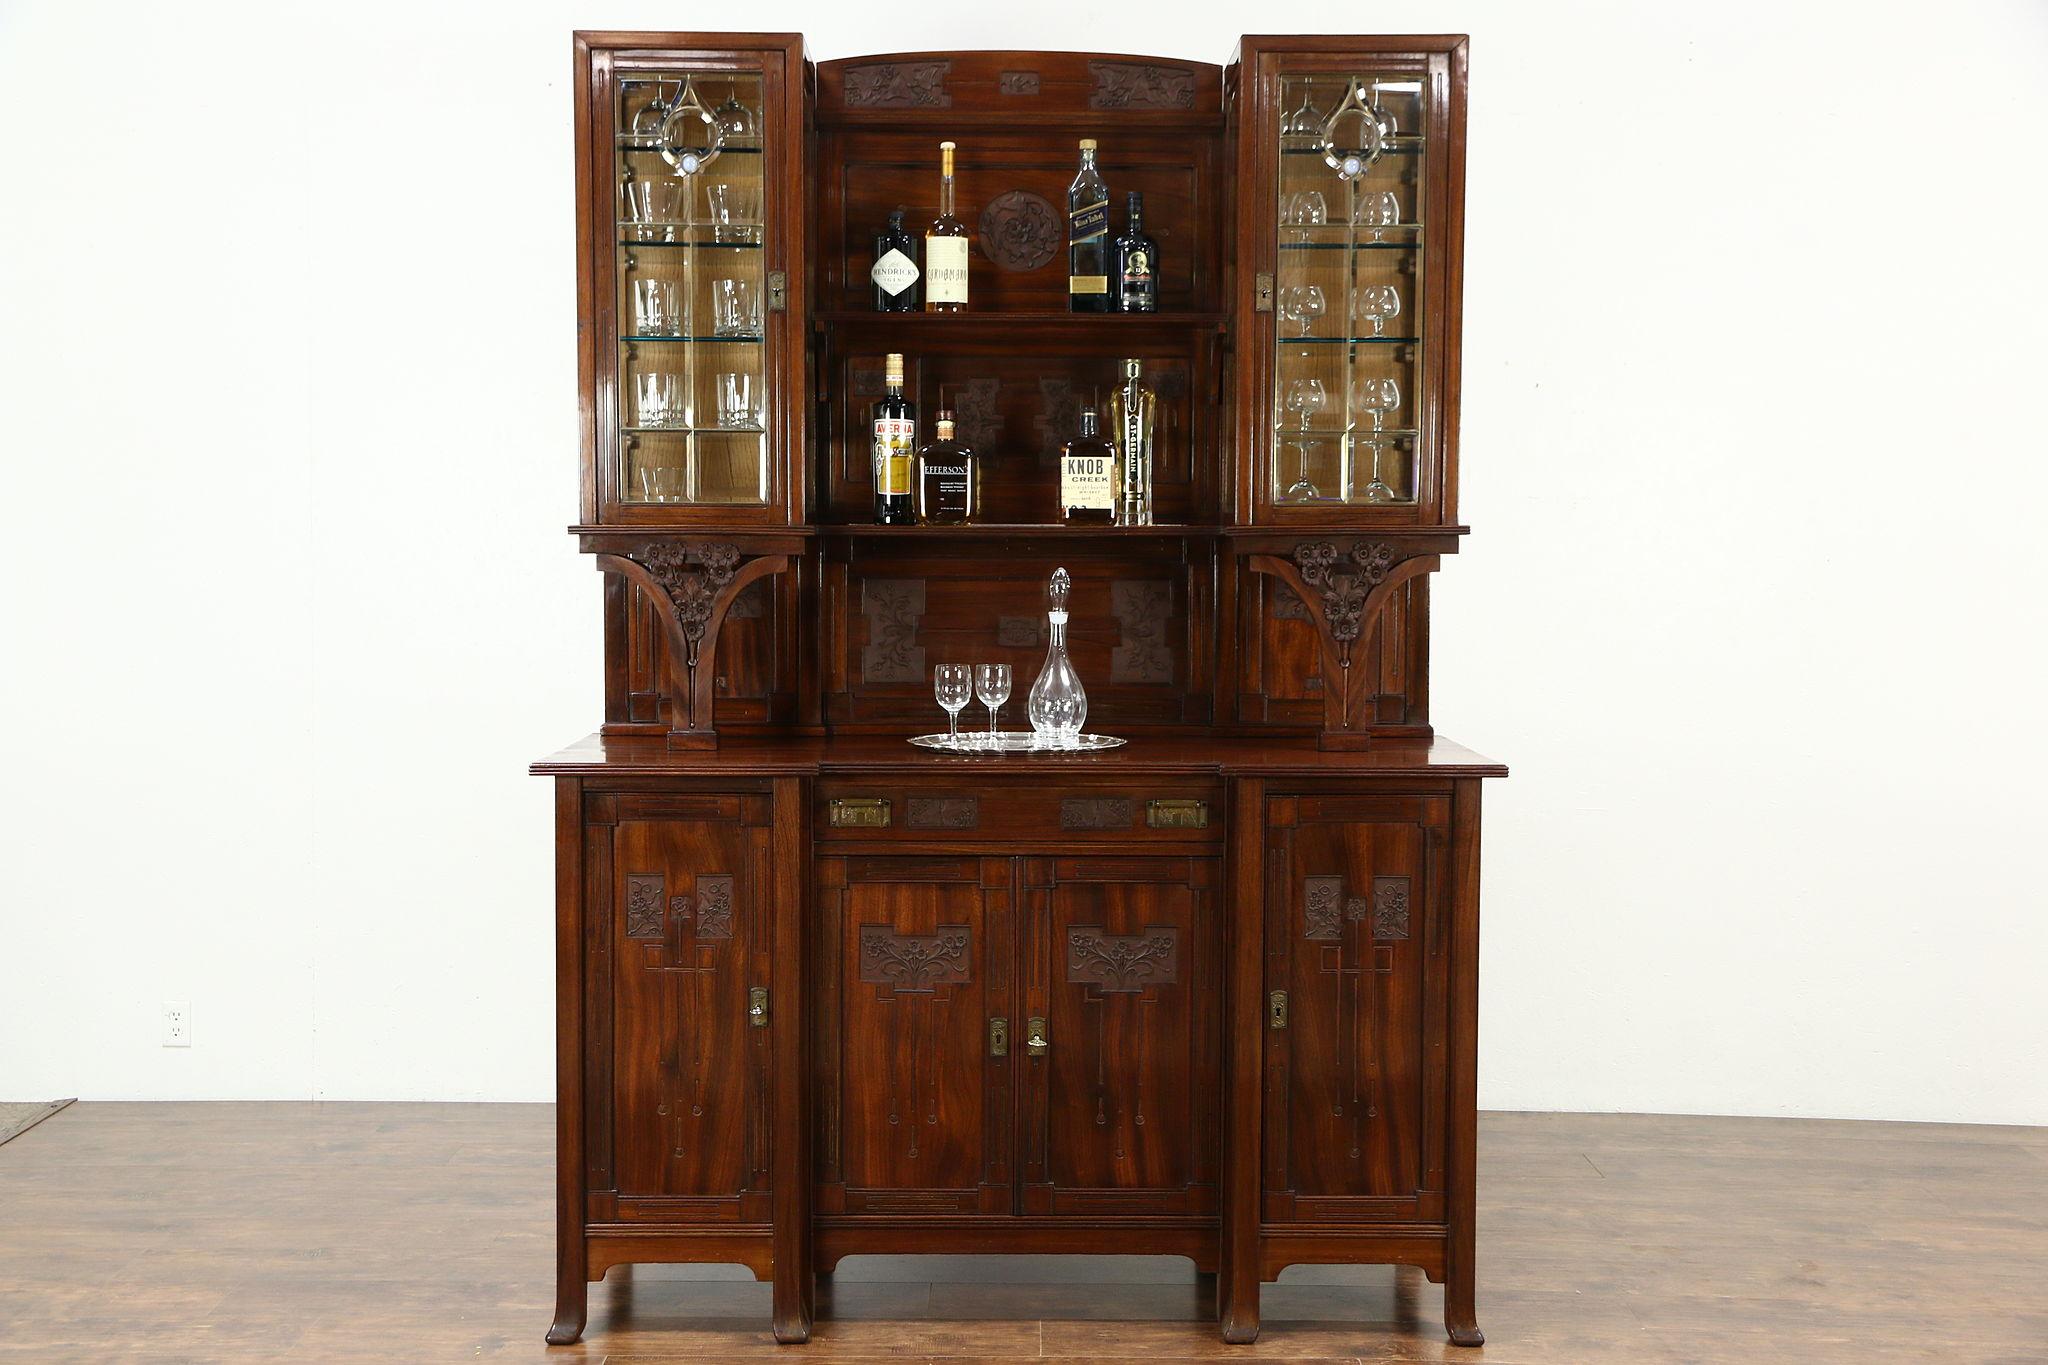 Superior Italian Antique 1925 Back Bar Or Sideboard U0026 China Cabinet, Leaded Glass ...